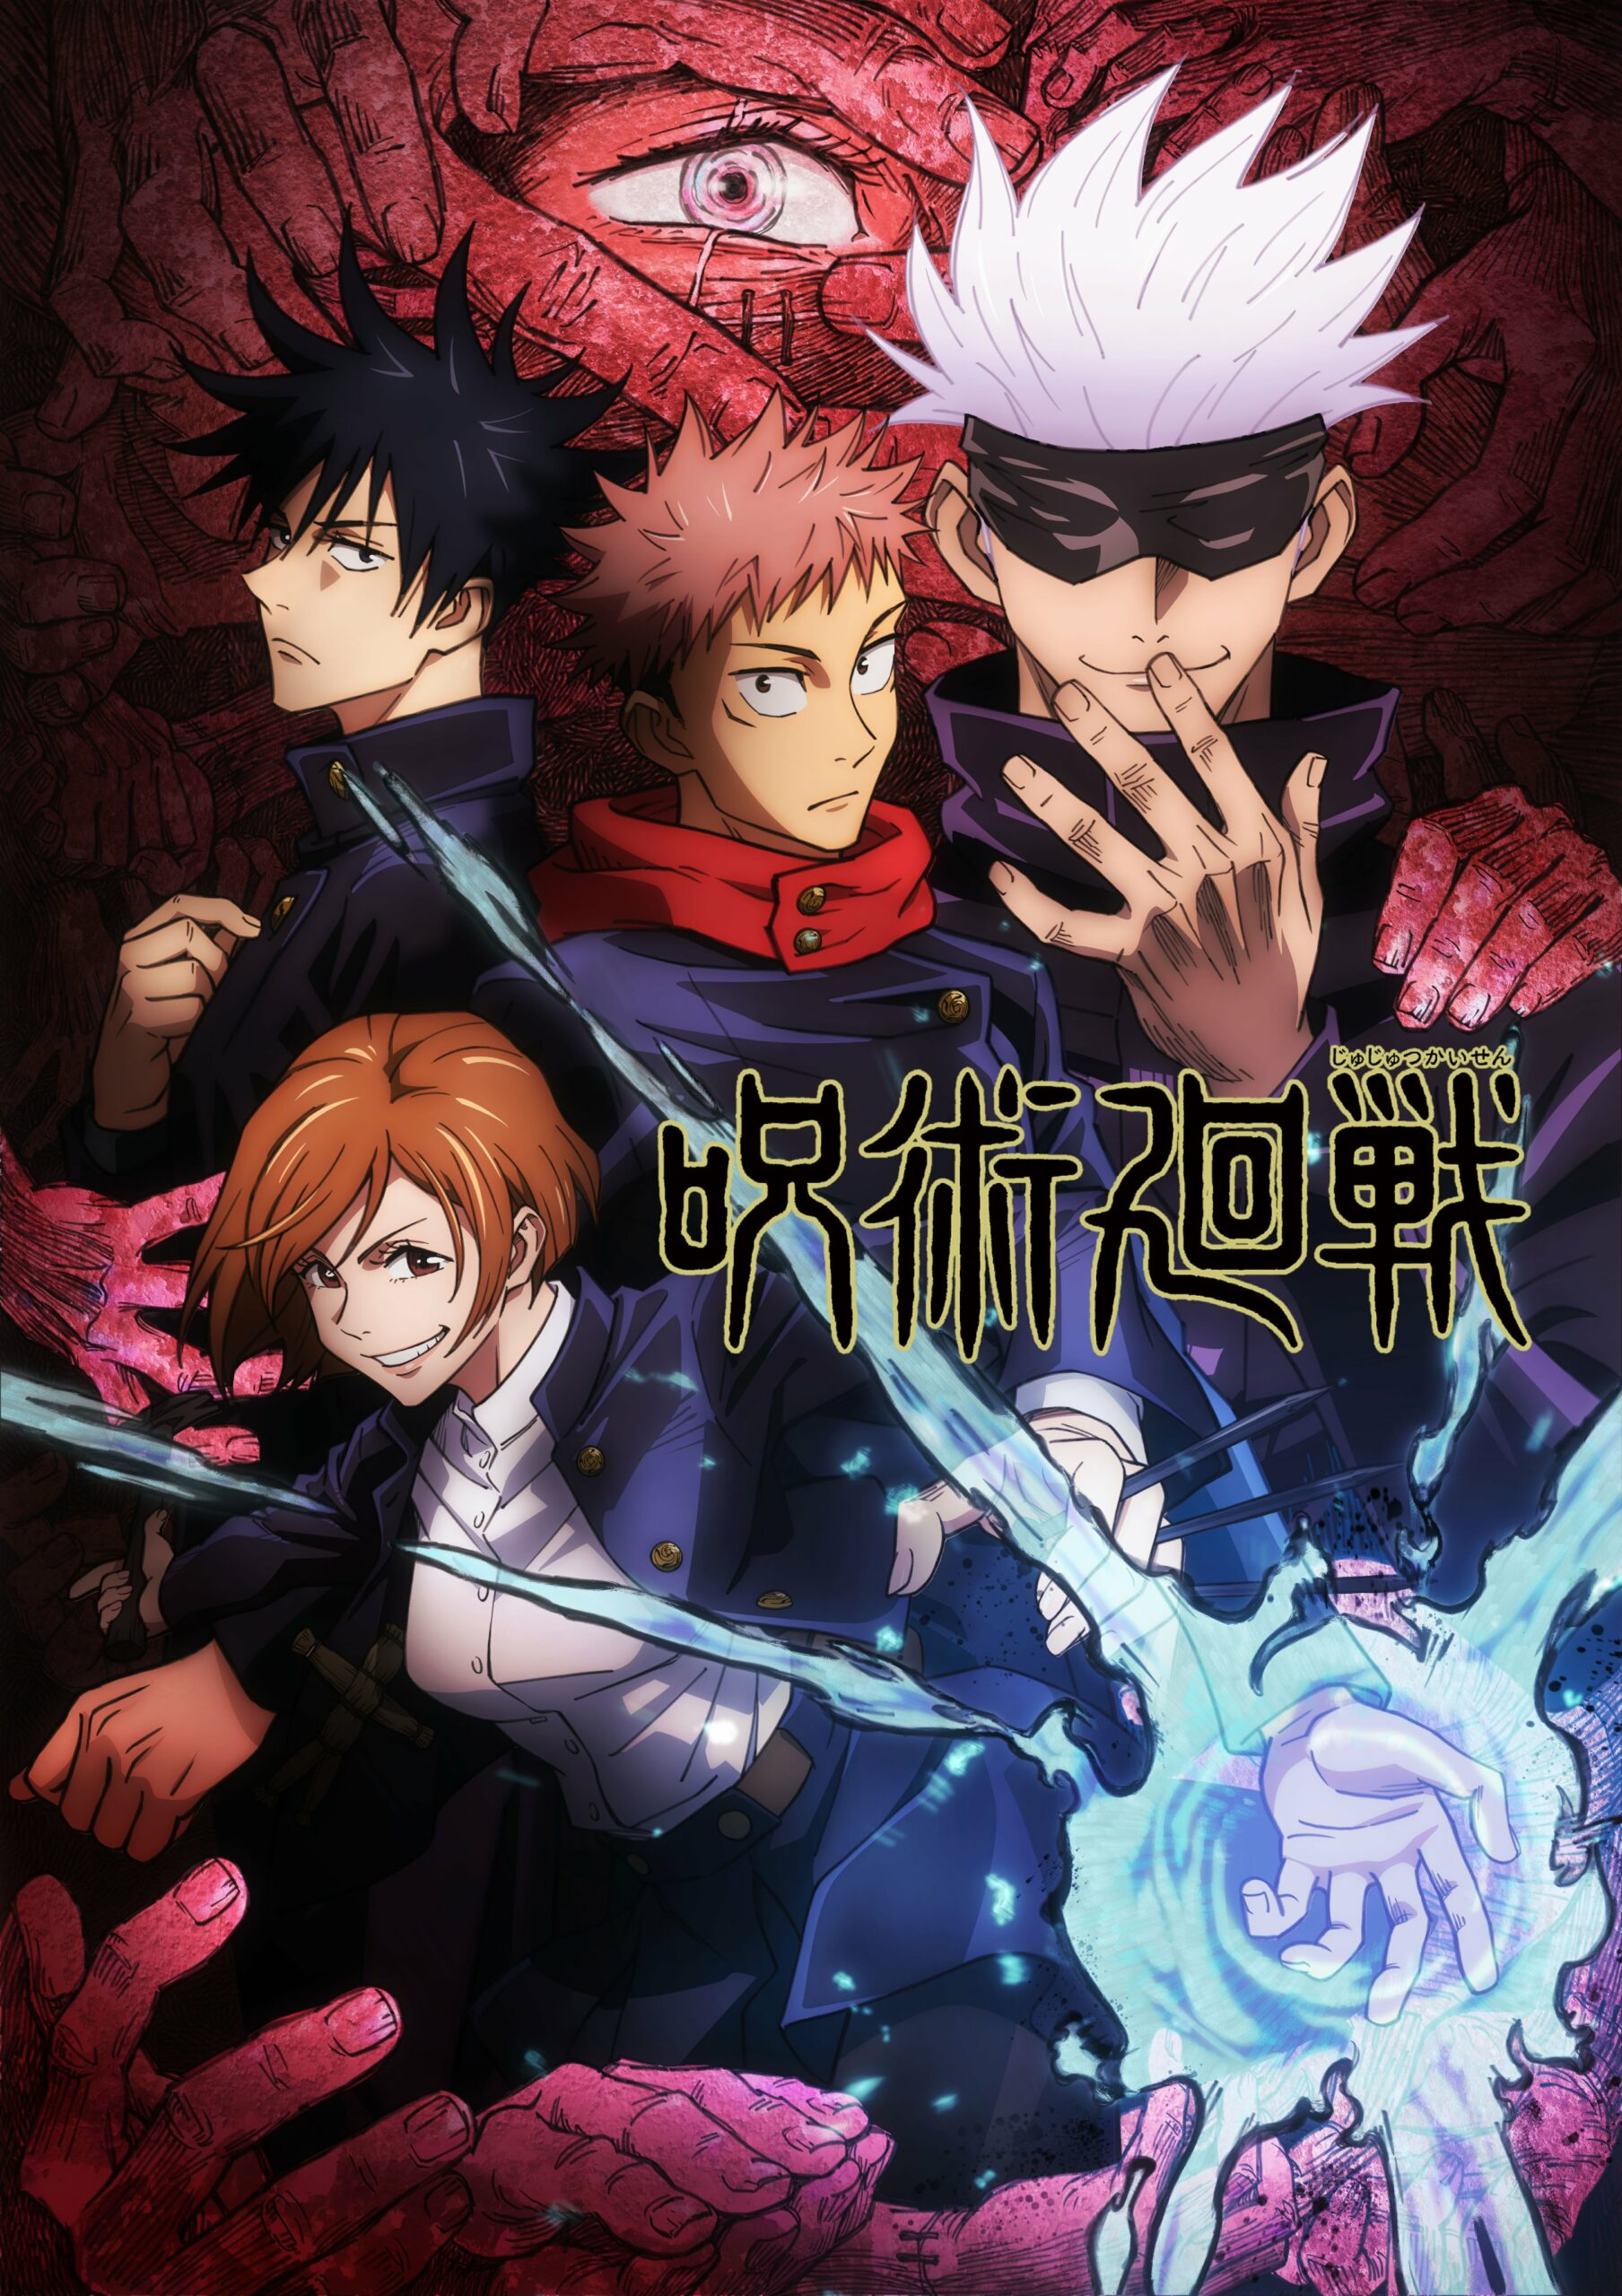 Jujutsu Kaisen Neues Visual Zur Anime Serie Anime2you